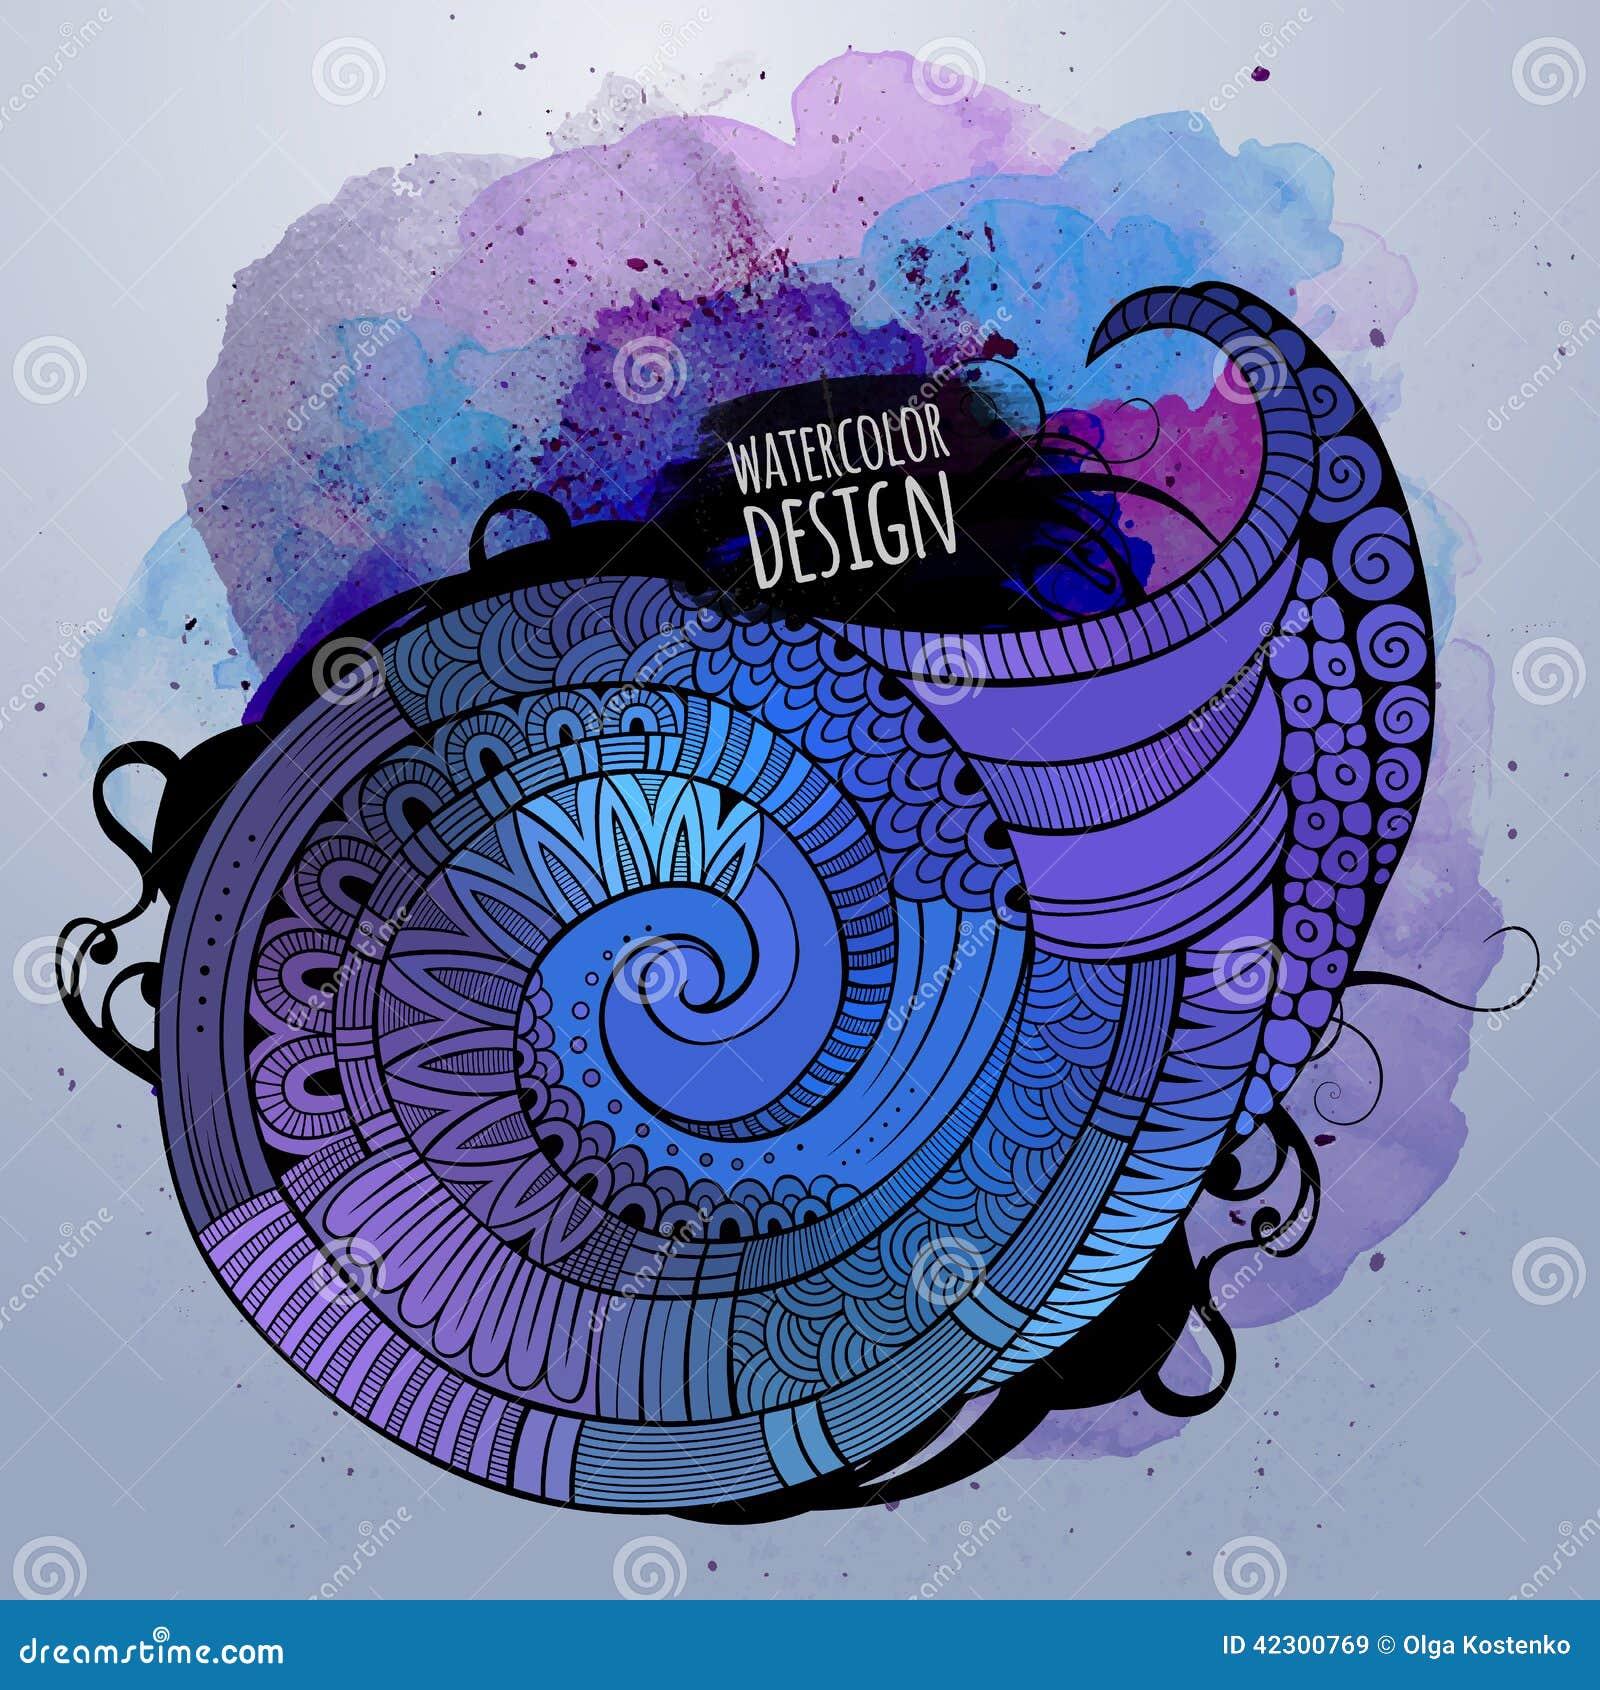 Painter Decorator Sign Stock Vector: Vector Watercolor Decorative Spiral Design Stock Vector